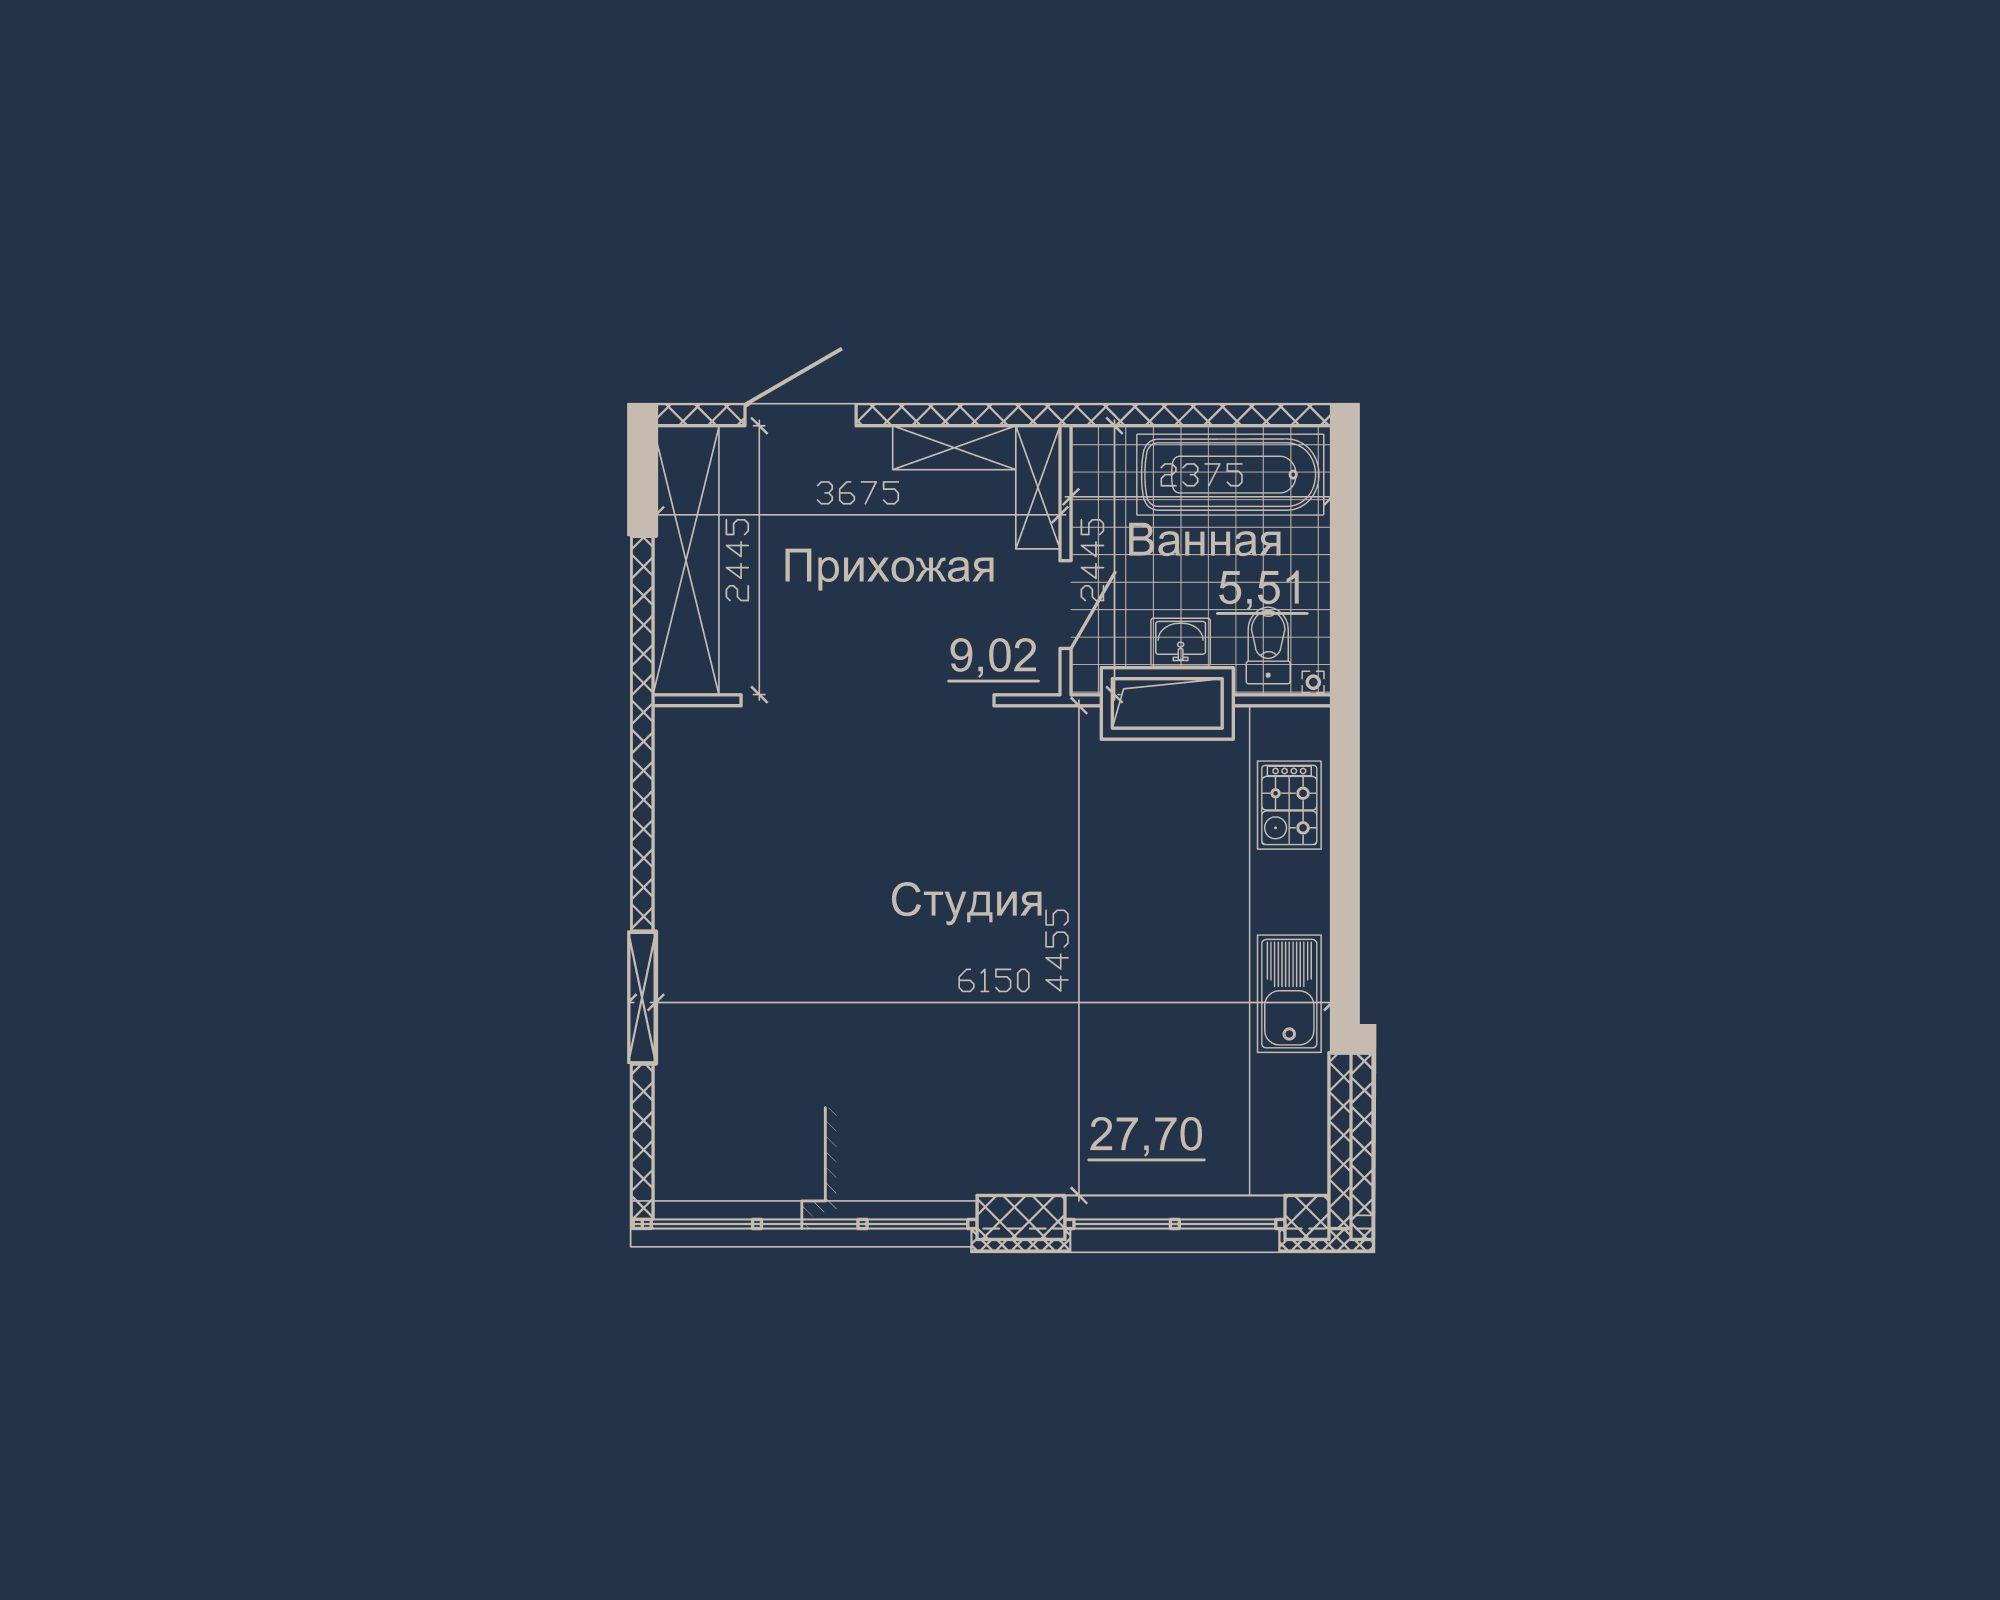 1-кімнатна квартира типу 10А у ЖК Nebo